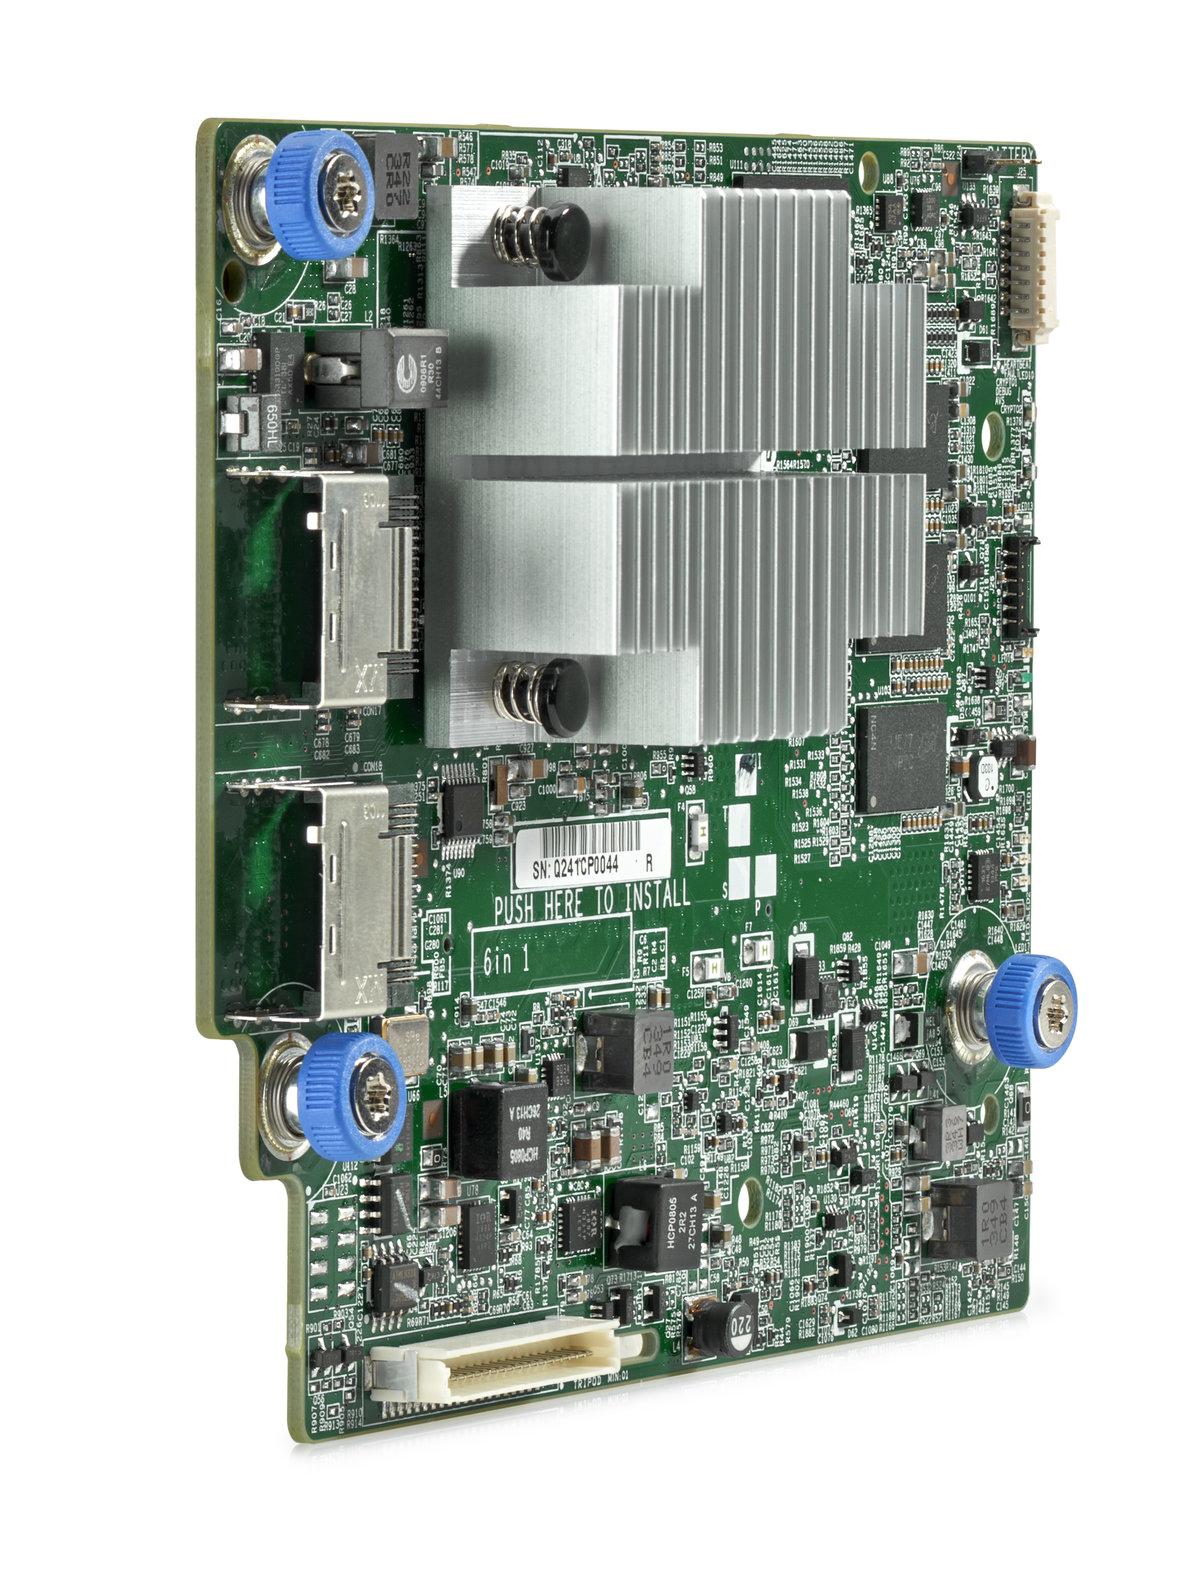 Hewlett Packard Enterprise Smart Array P440ar/2GB with FBWC - Storage  controller (RAID) - 26 Channel - SATA 6Gb/s / SAS 12Gb/s - 12 Gbit/s - RAID  0,